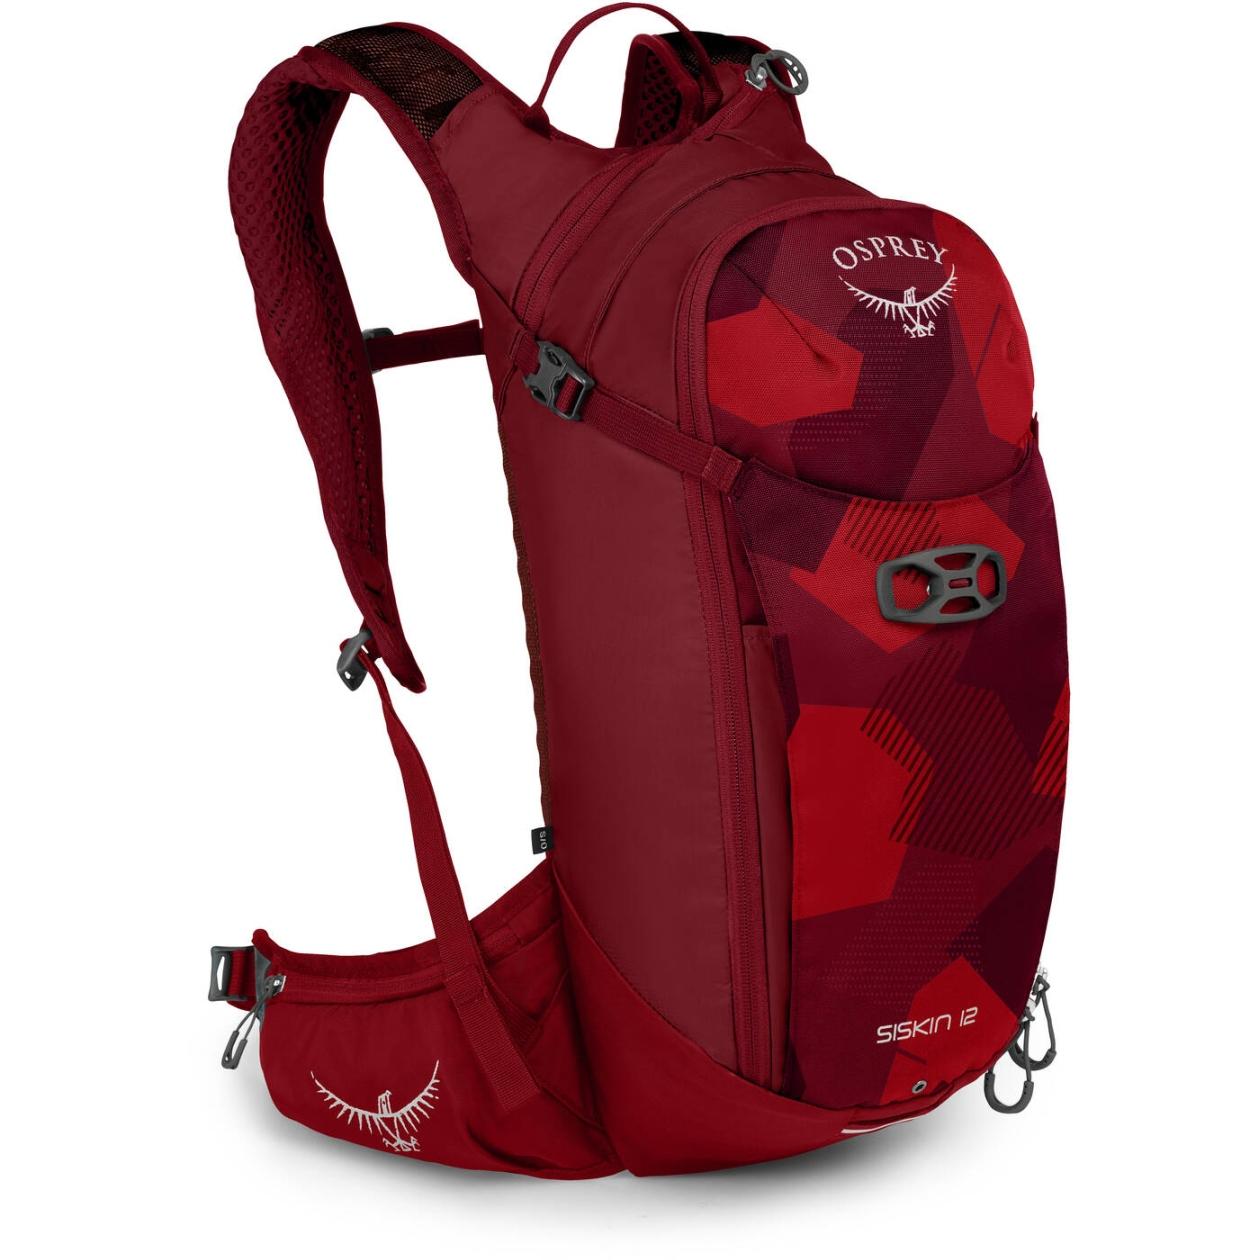 Osprey Siskin 12 Hydration Backpack - Molten Red